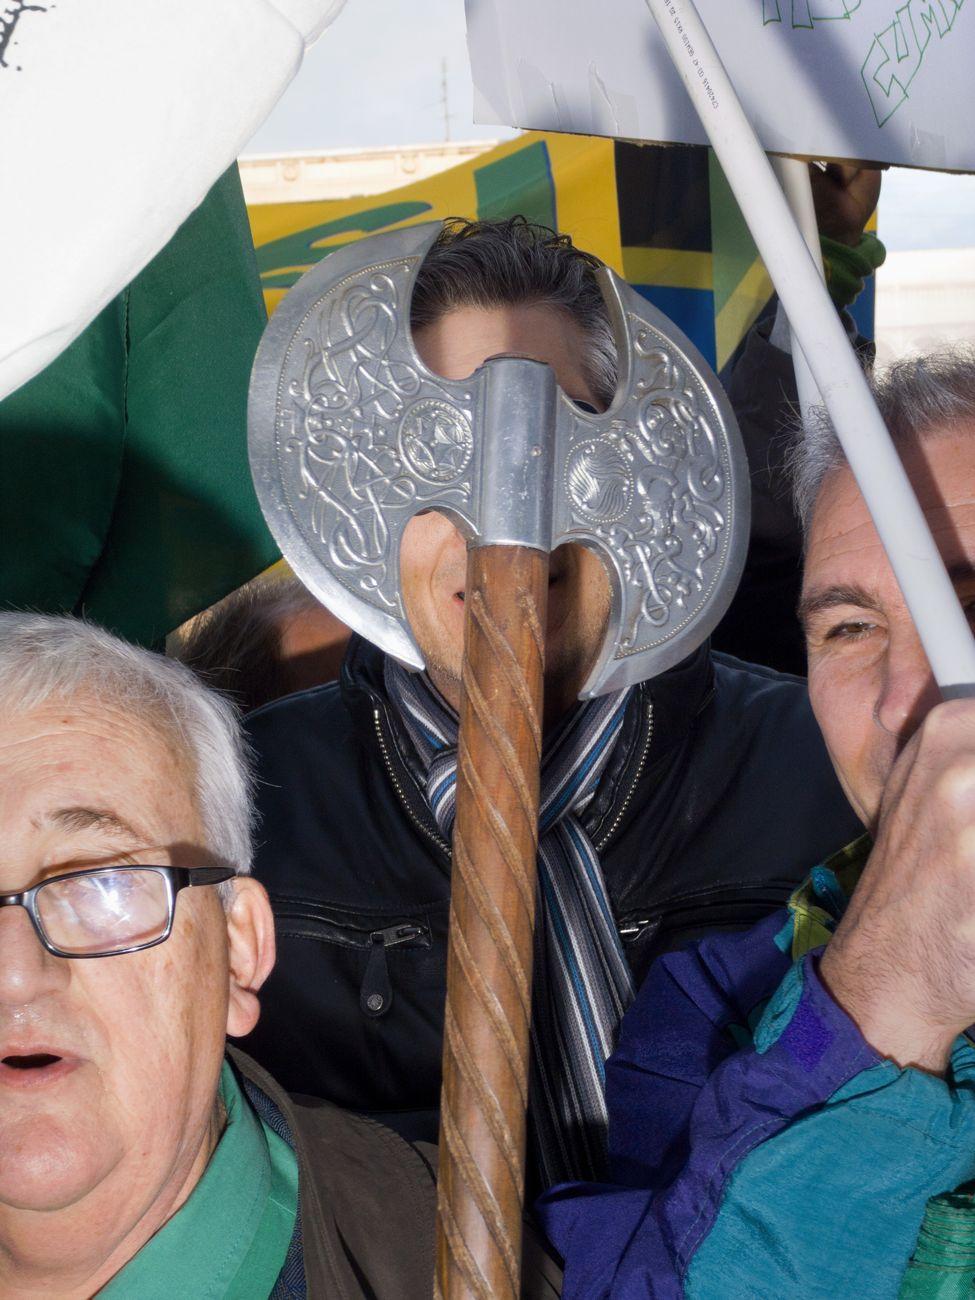 Luca Santese & Marco P. Valli, Realpolitik - Lega Nord Party